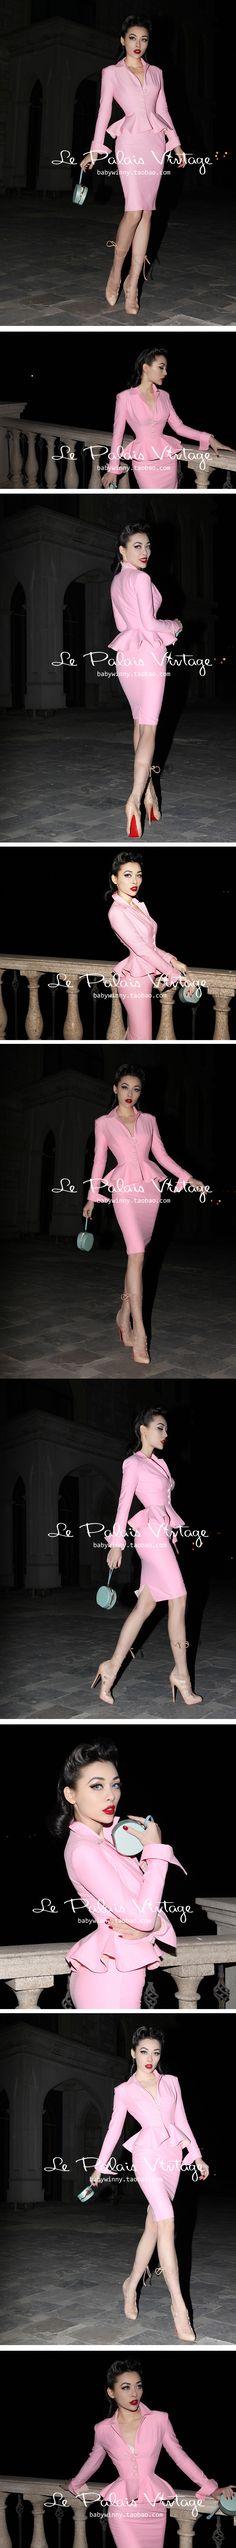 le palais vintage 限量 50年代复古优雅粉色紧身铅笔裙套 0.7kg-淘宝网